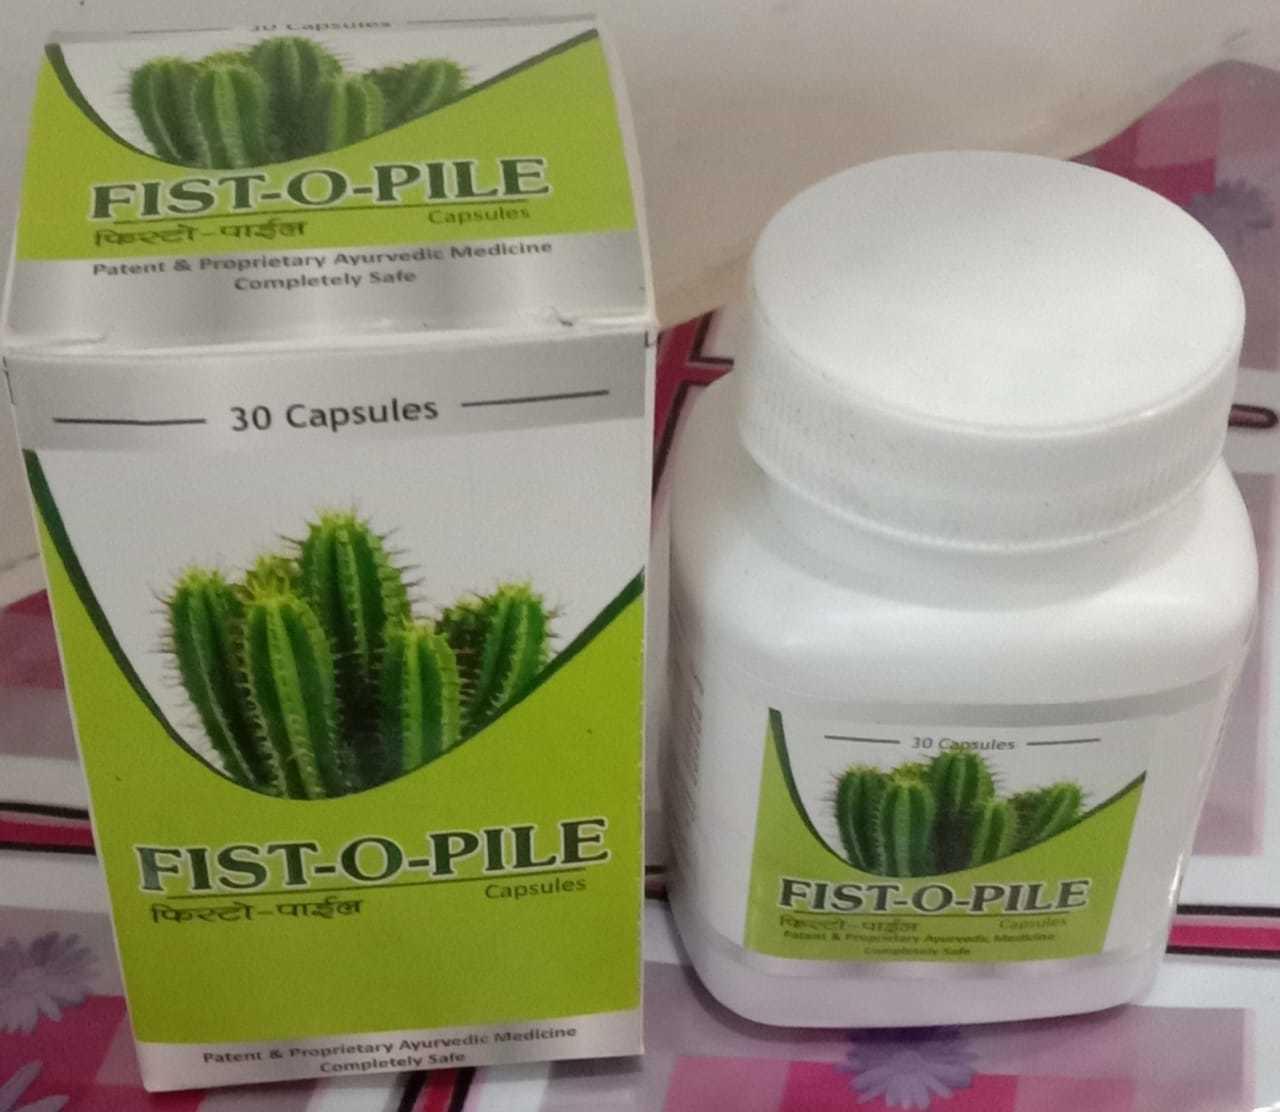 Cap. FIST-o-PILE